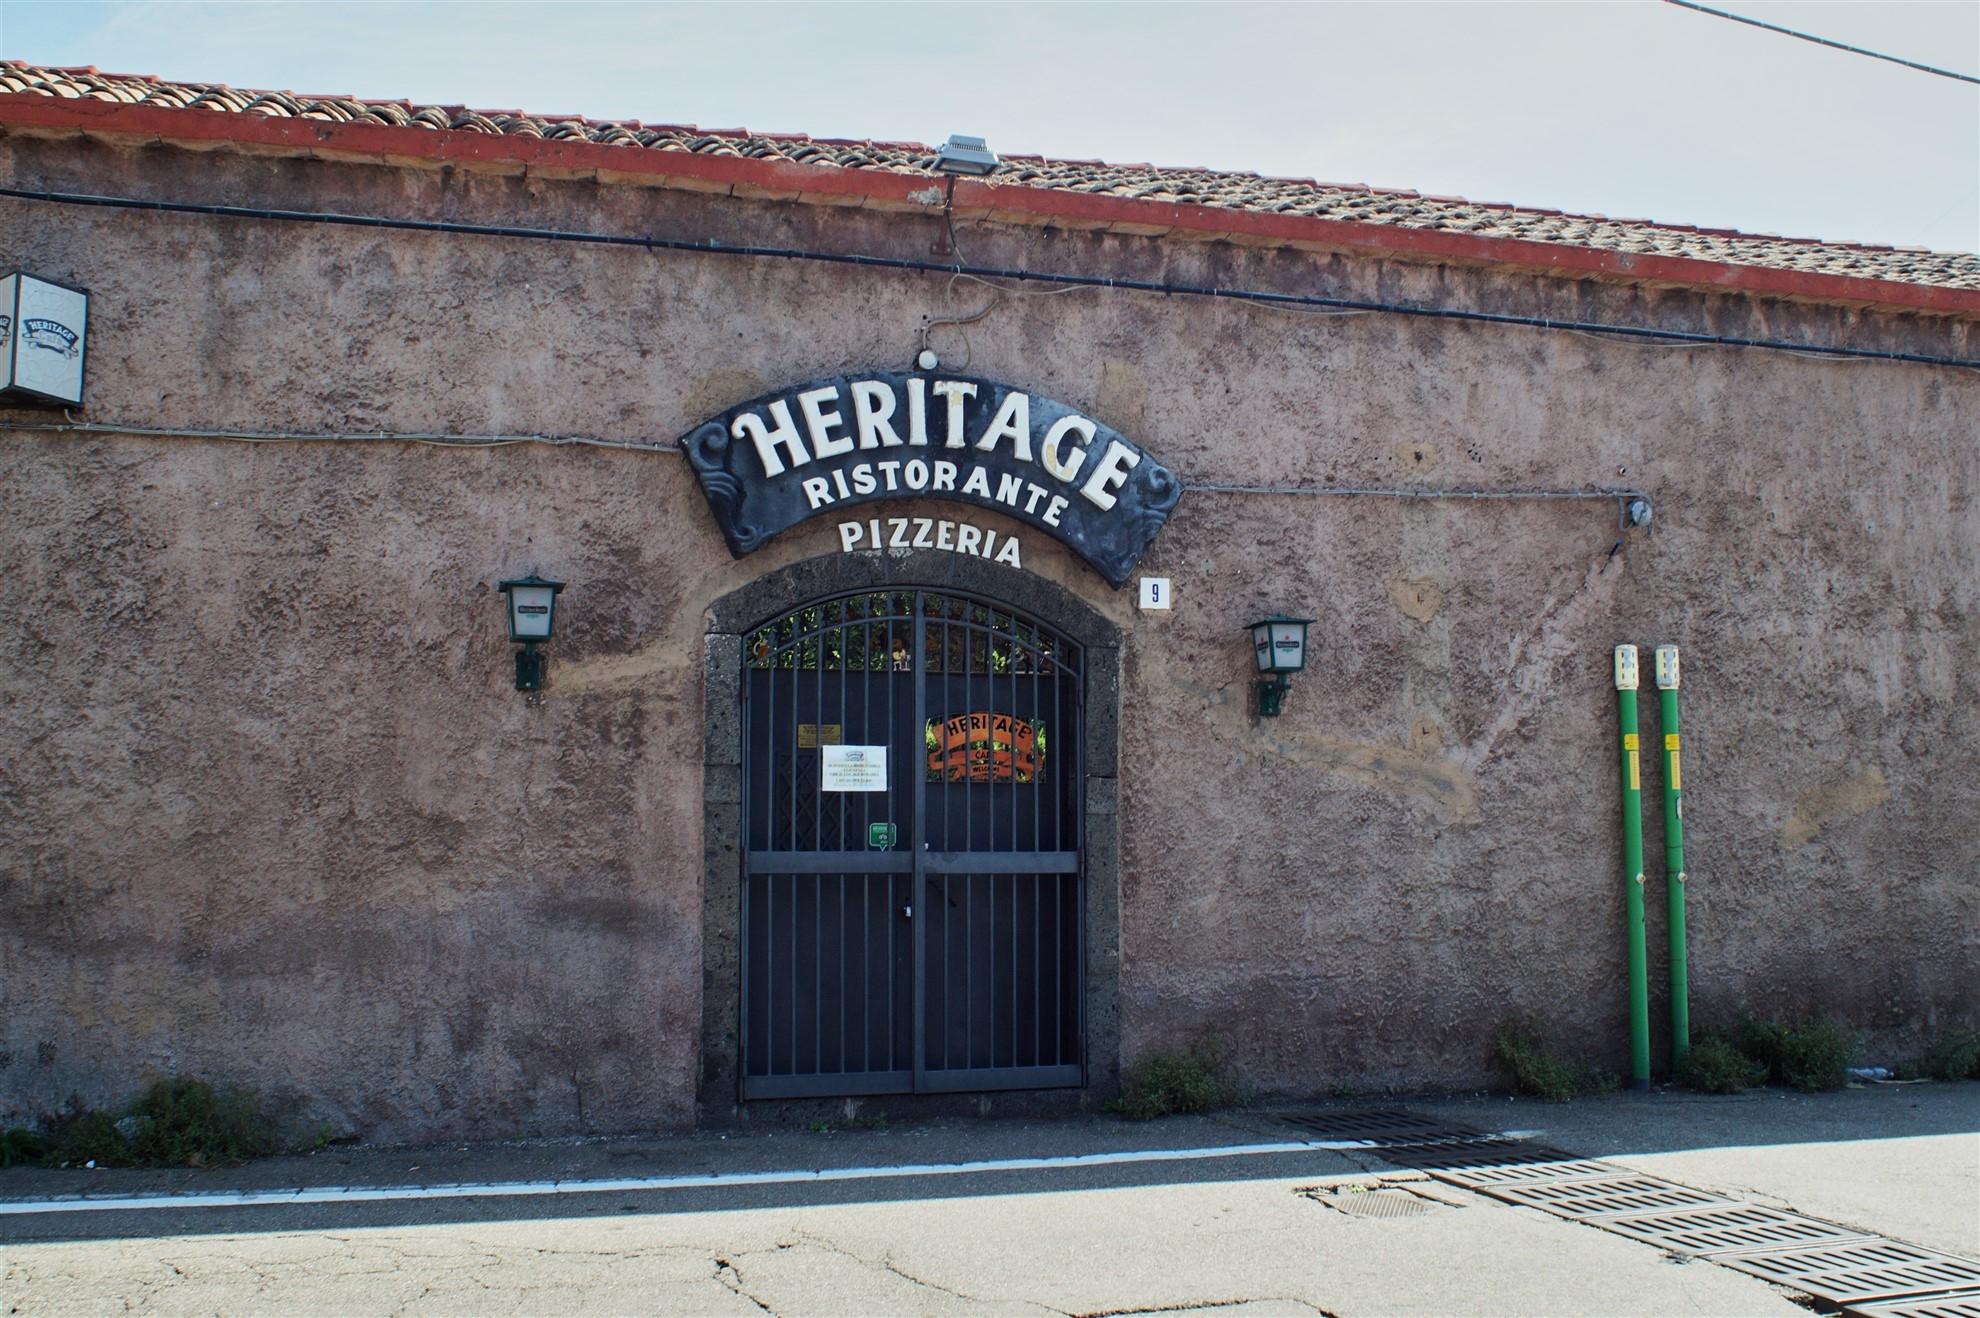 Heritage - Pizzeria Ristorante, Aci Sant'Antonio